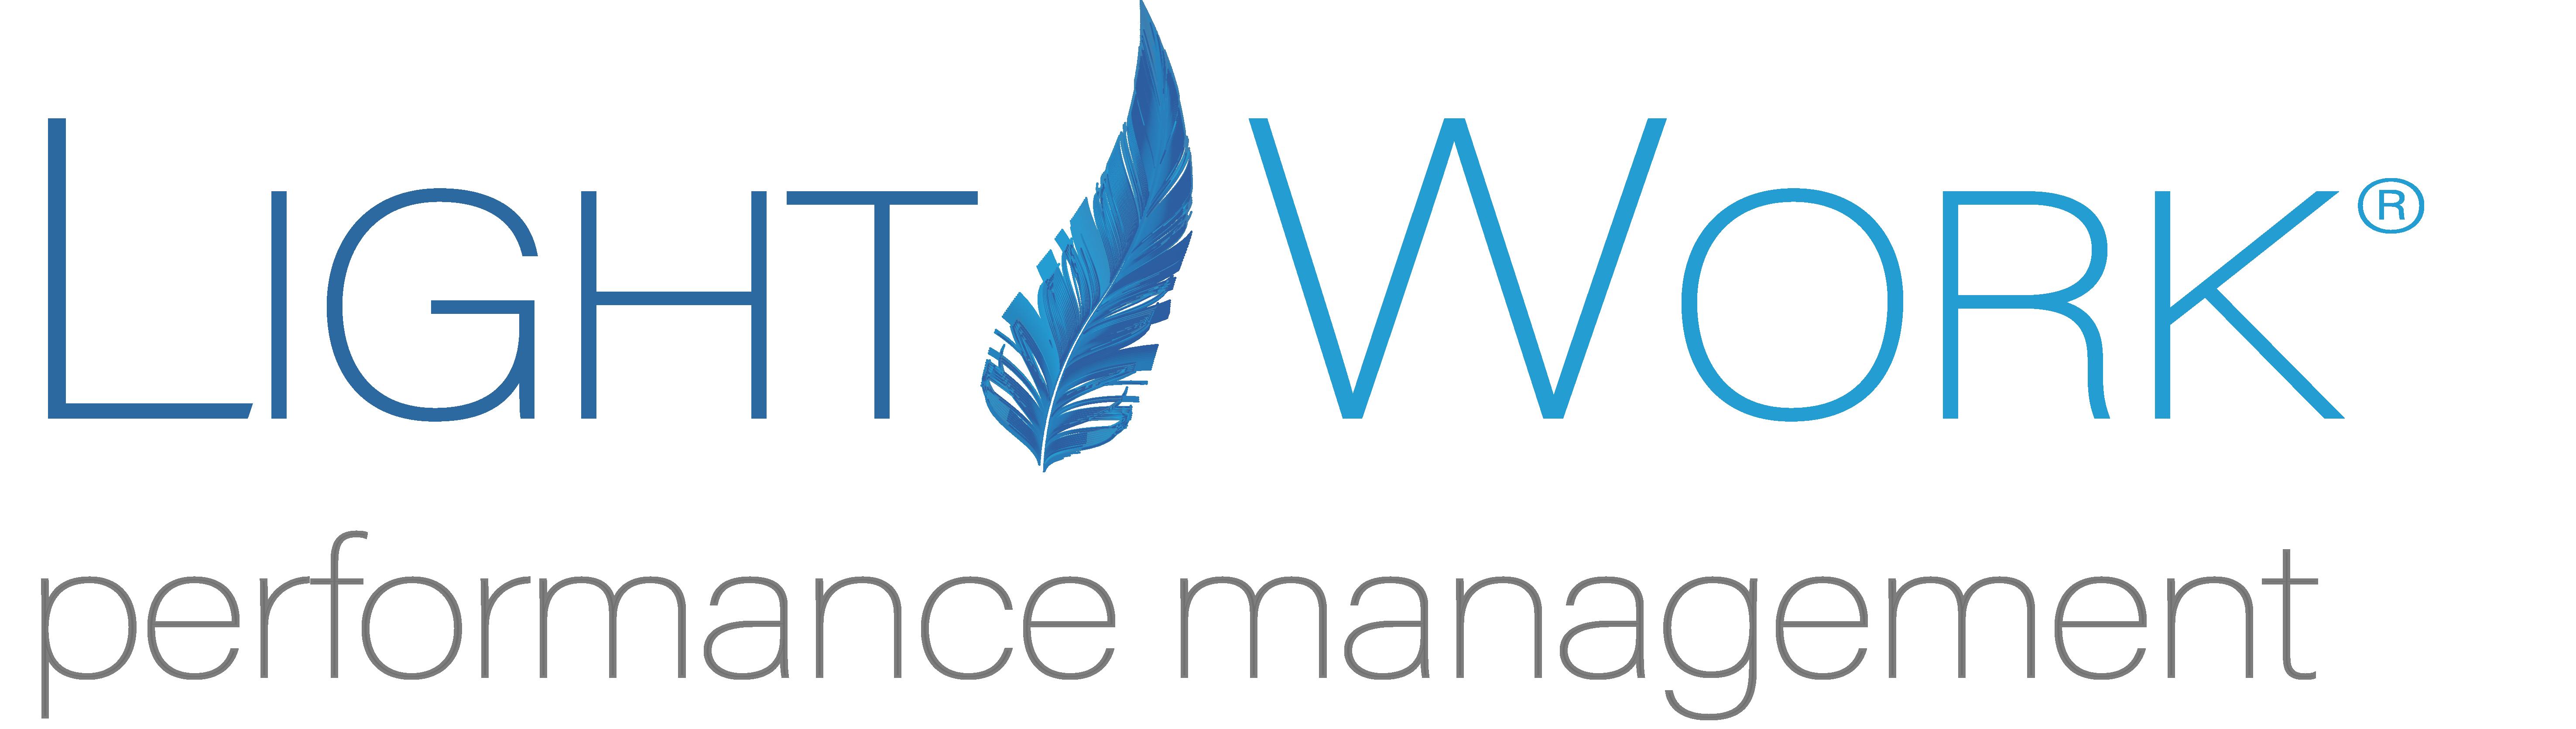 LightWork Performance Management logo